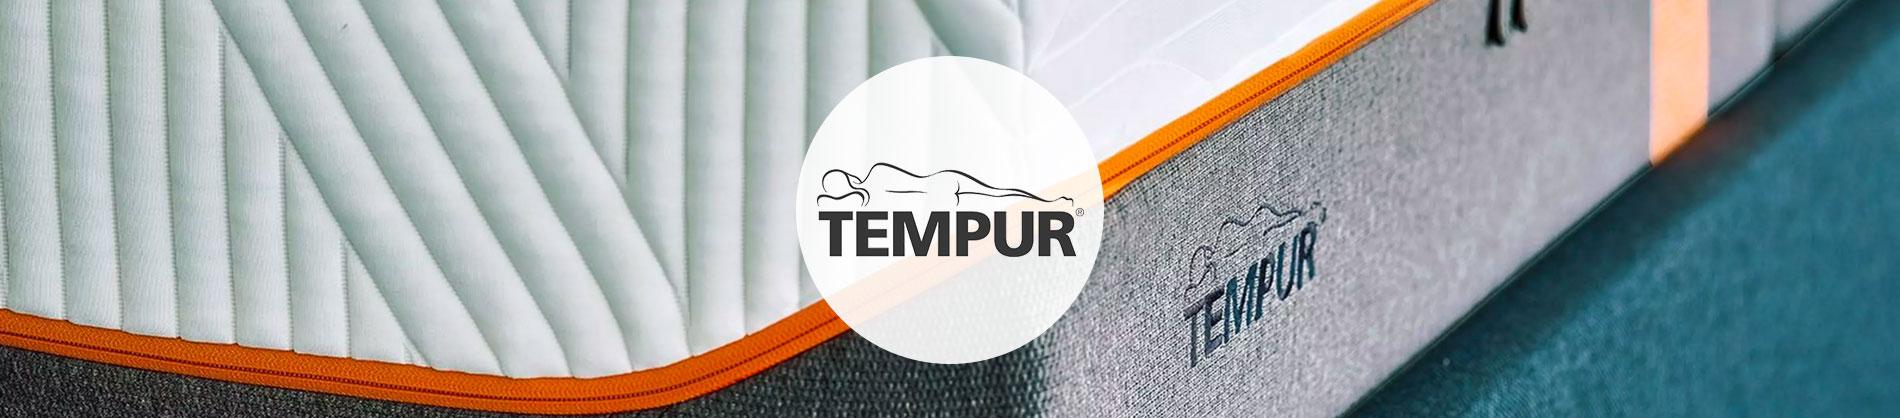 Colchones Tempur en Córdoba